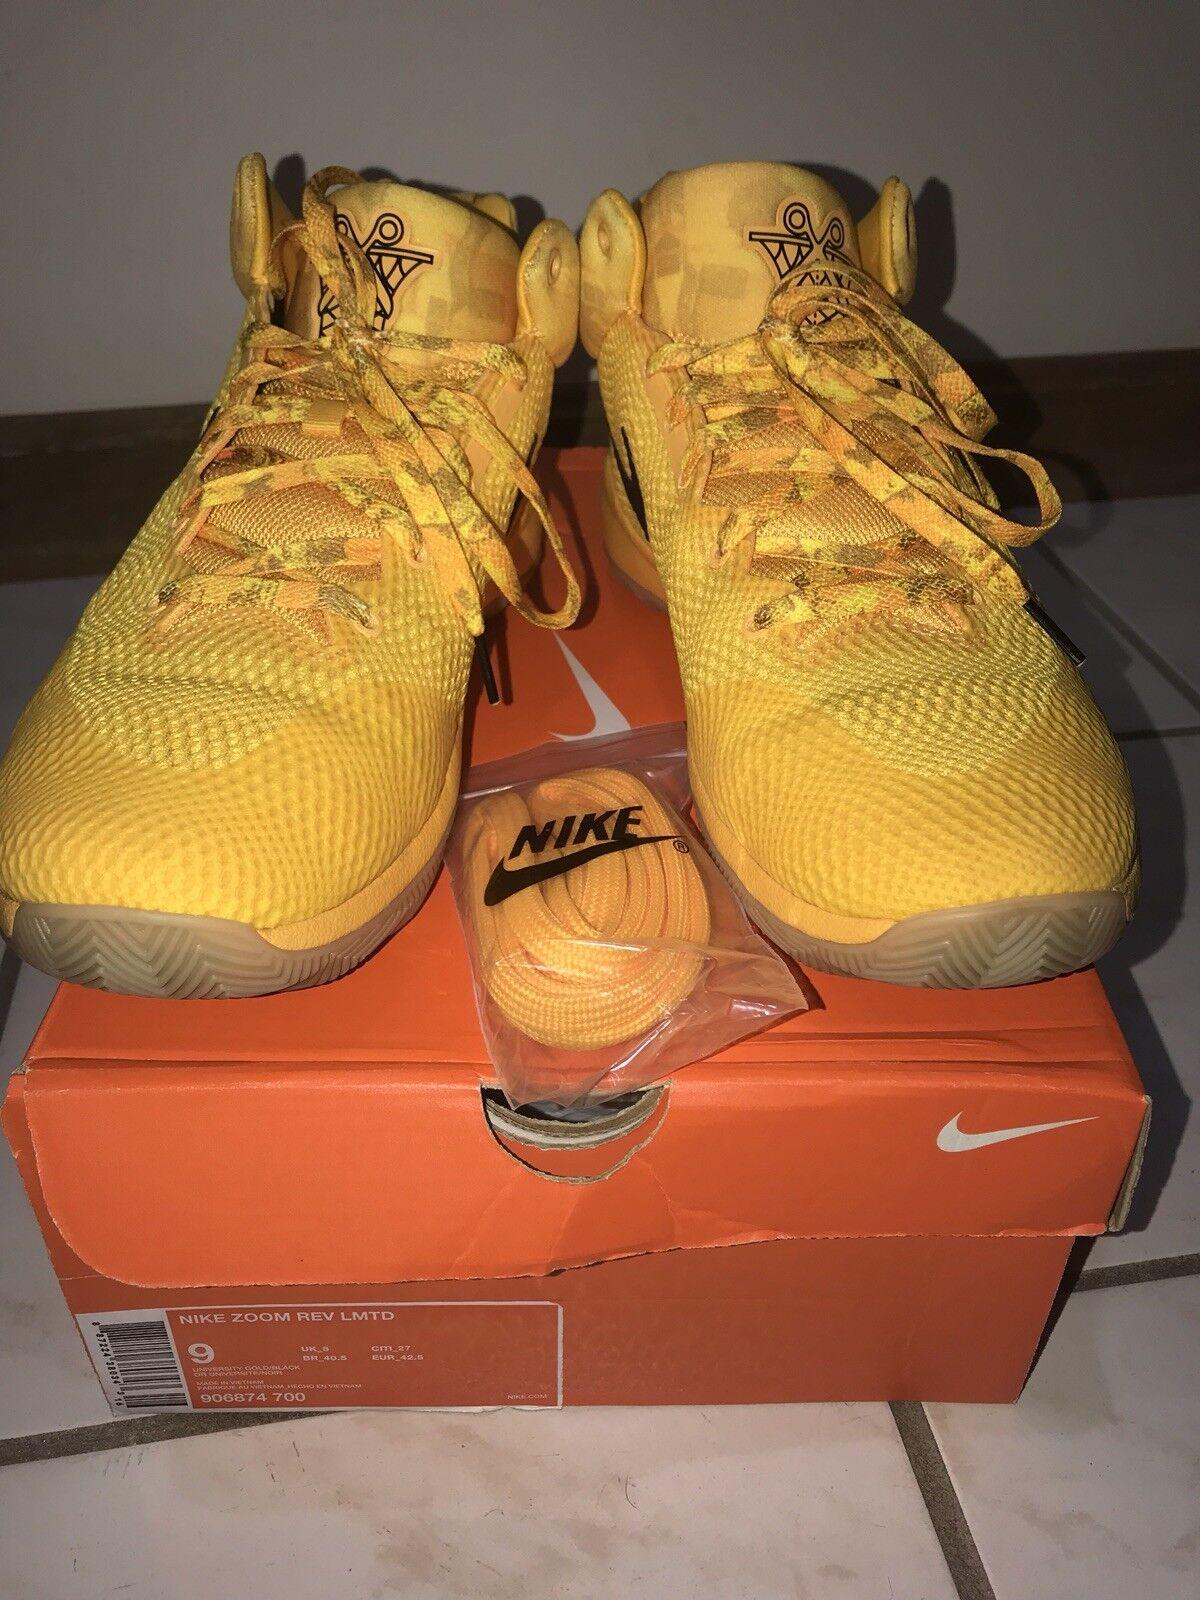 Nike Tamaño Zoom hyperrev Limited 'baloncesto Hombre Tamaño Nike 9   906874 700 699c0d